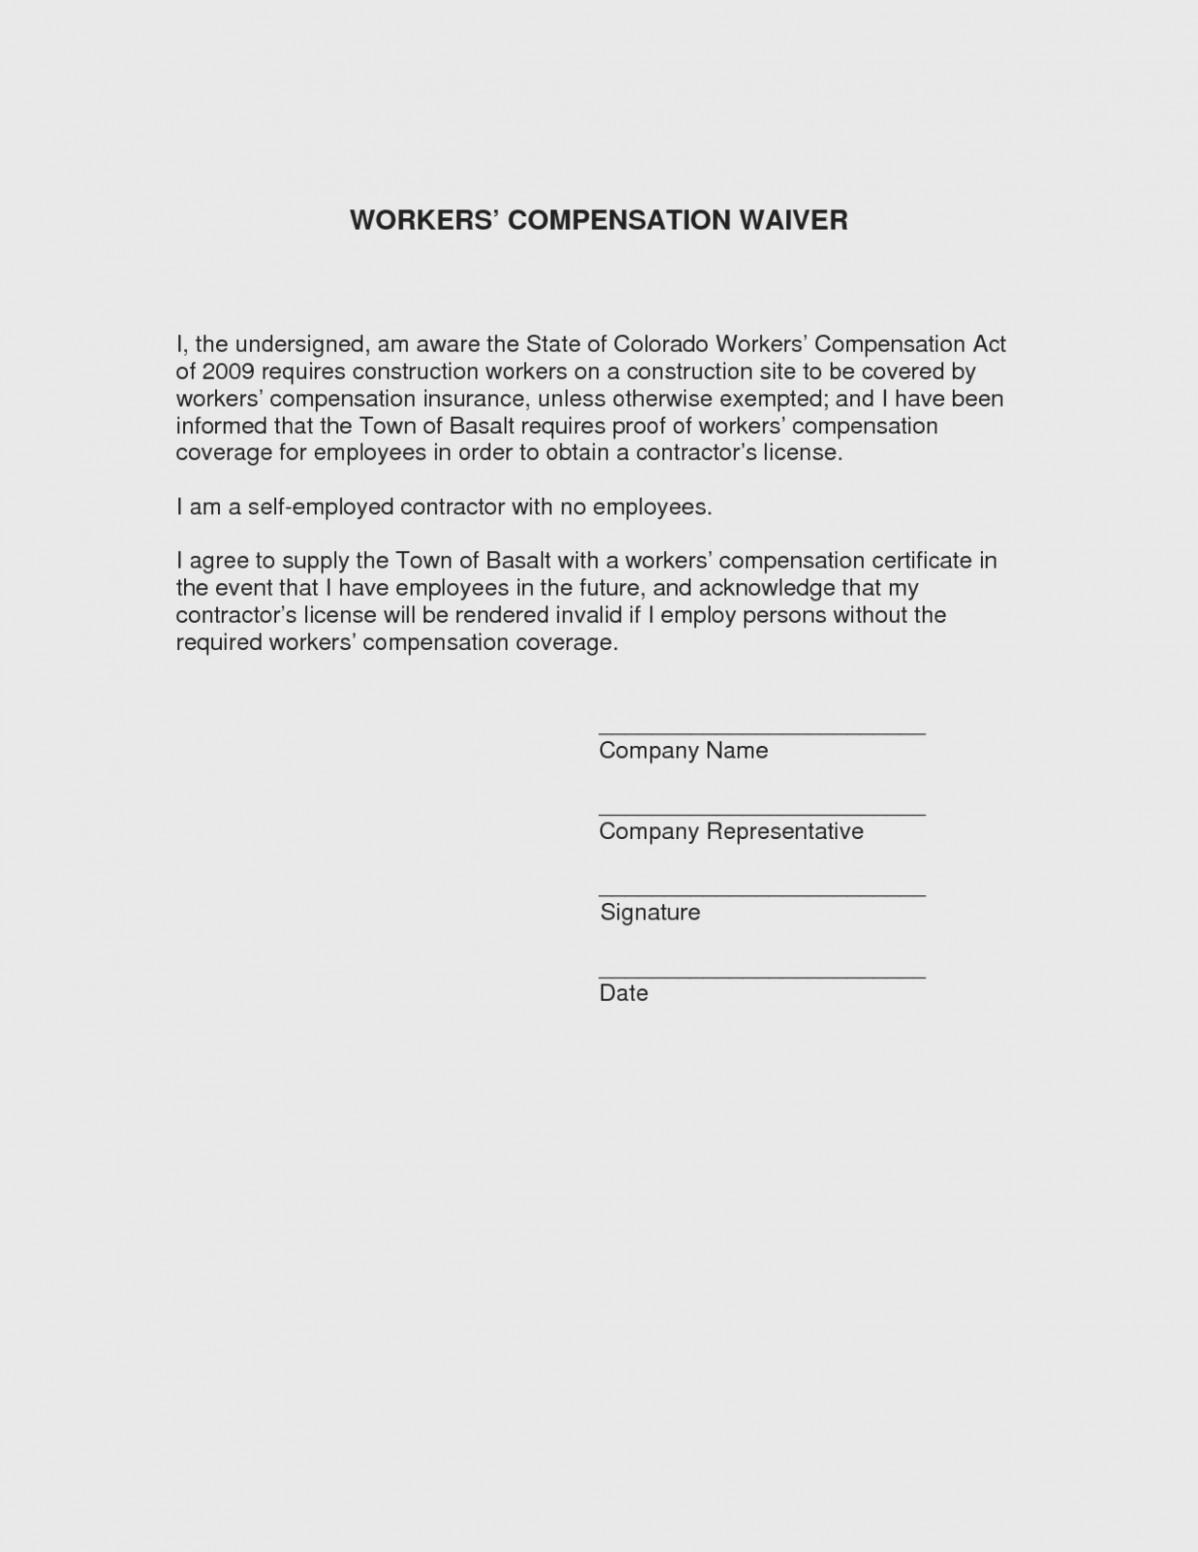 Colorado Workers Comp Waiver form 11 top Risks attending Colorado Workmans